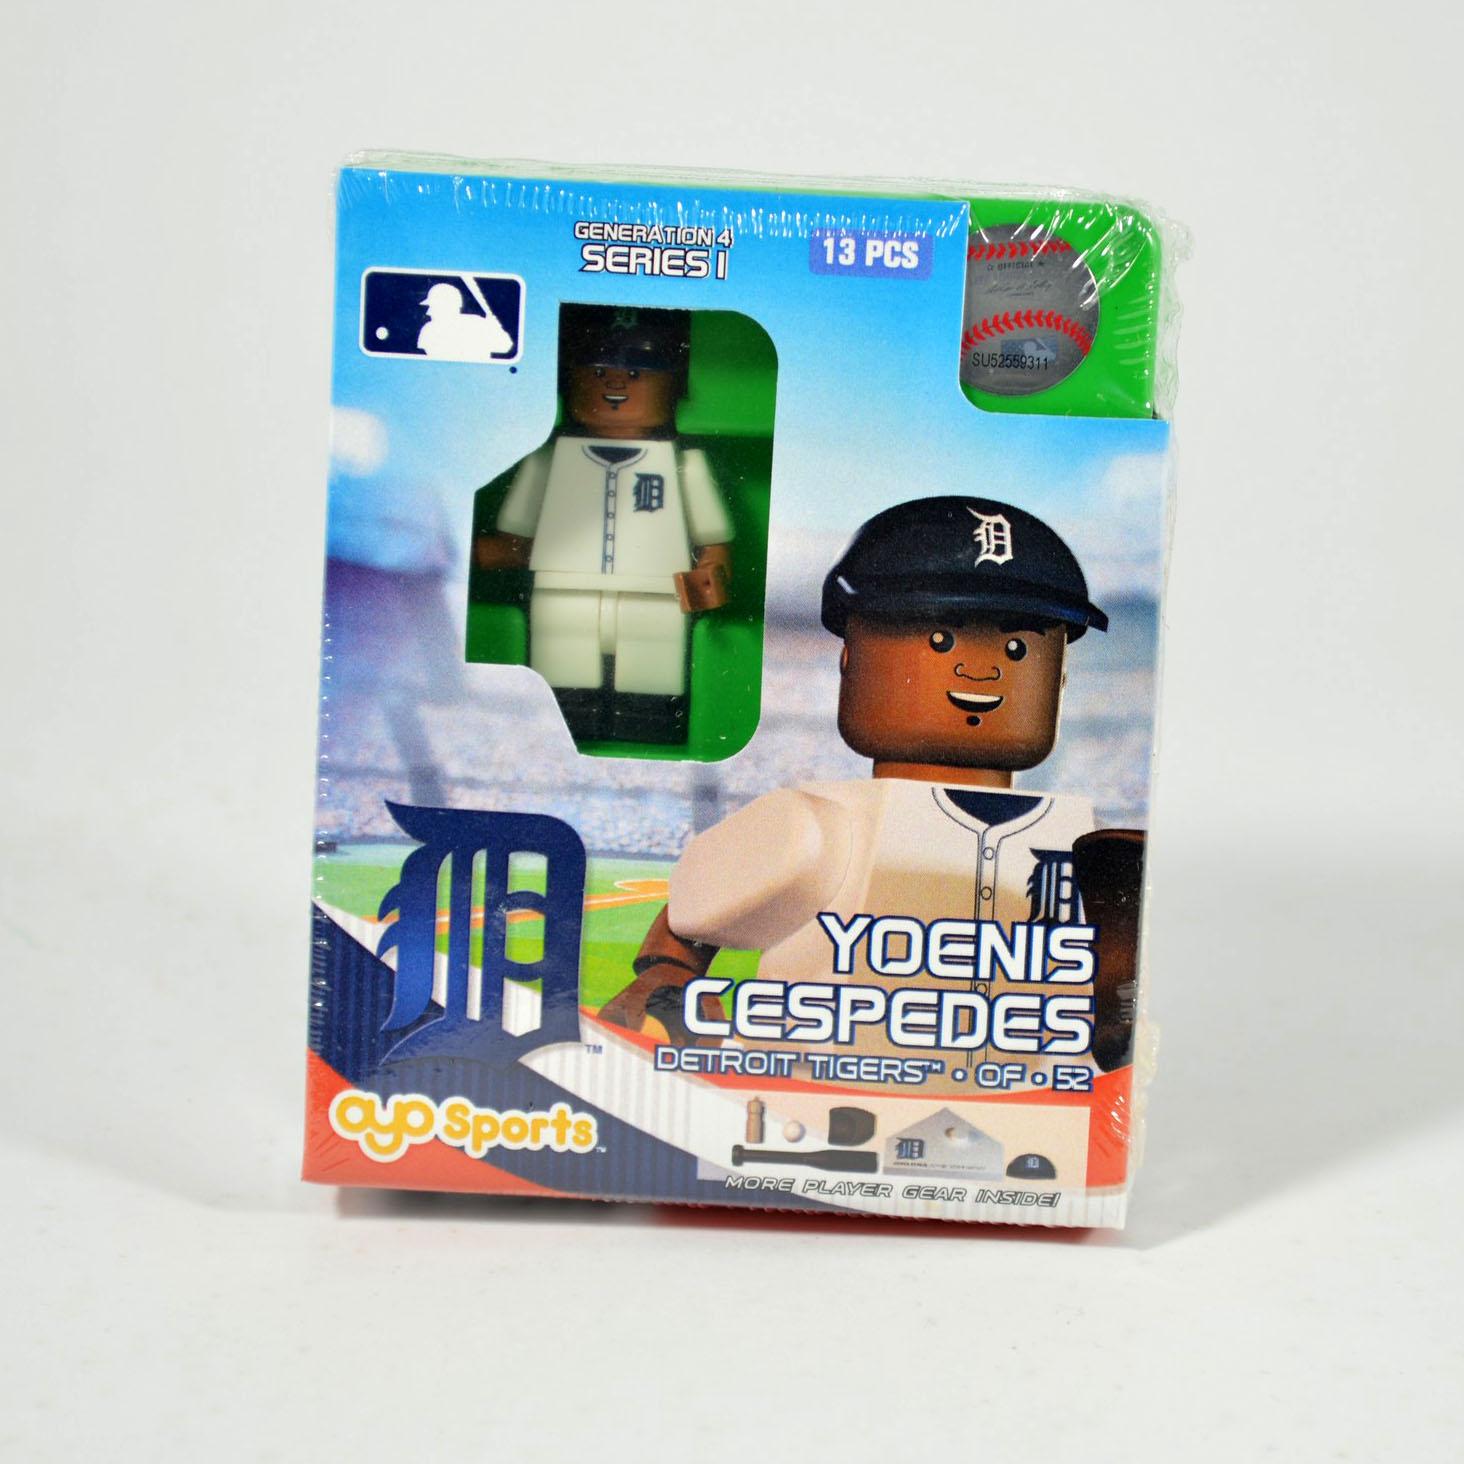 Johnny Cueto #47 Royals W.S.C Series 8 Generation 4 Baseball OYO MiniFigure